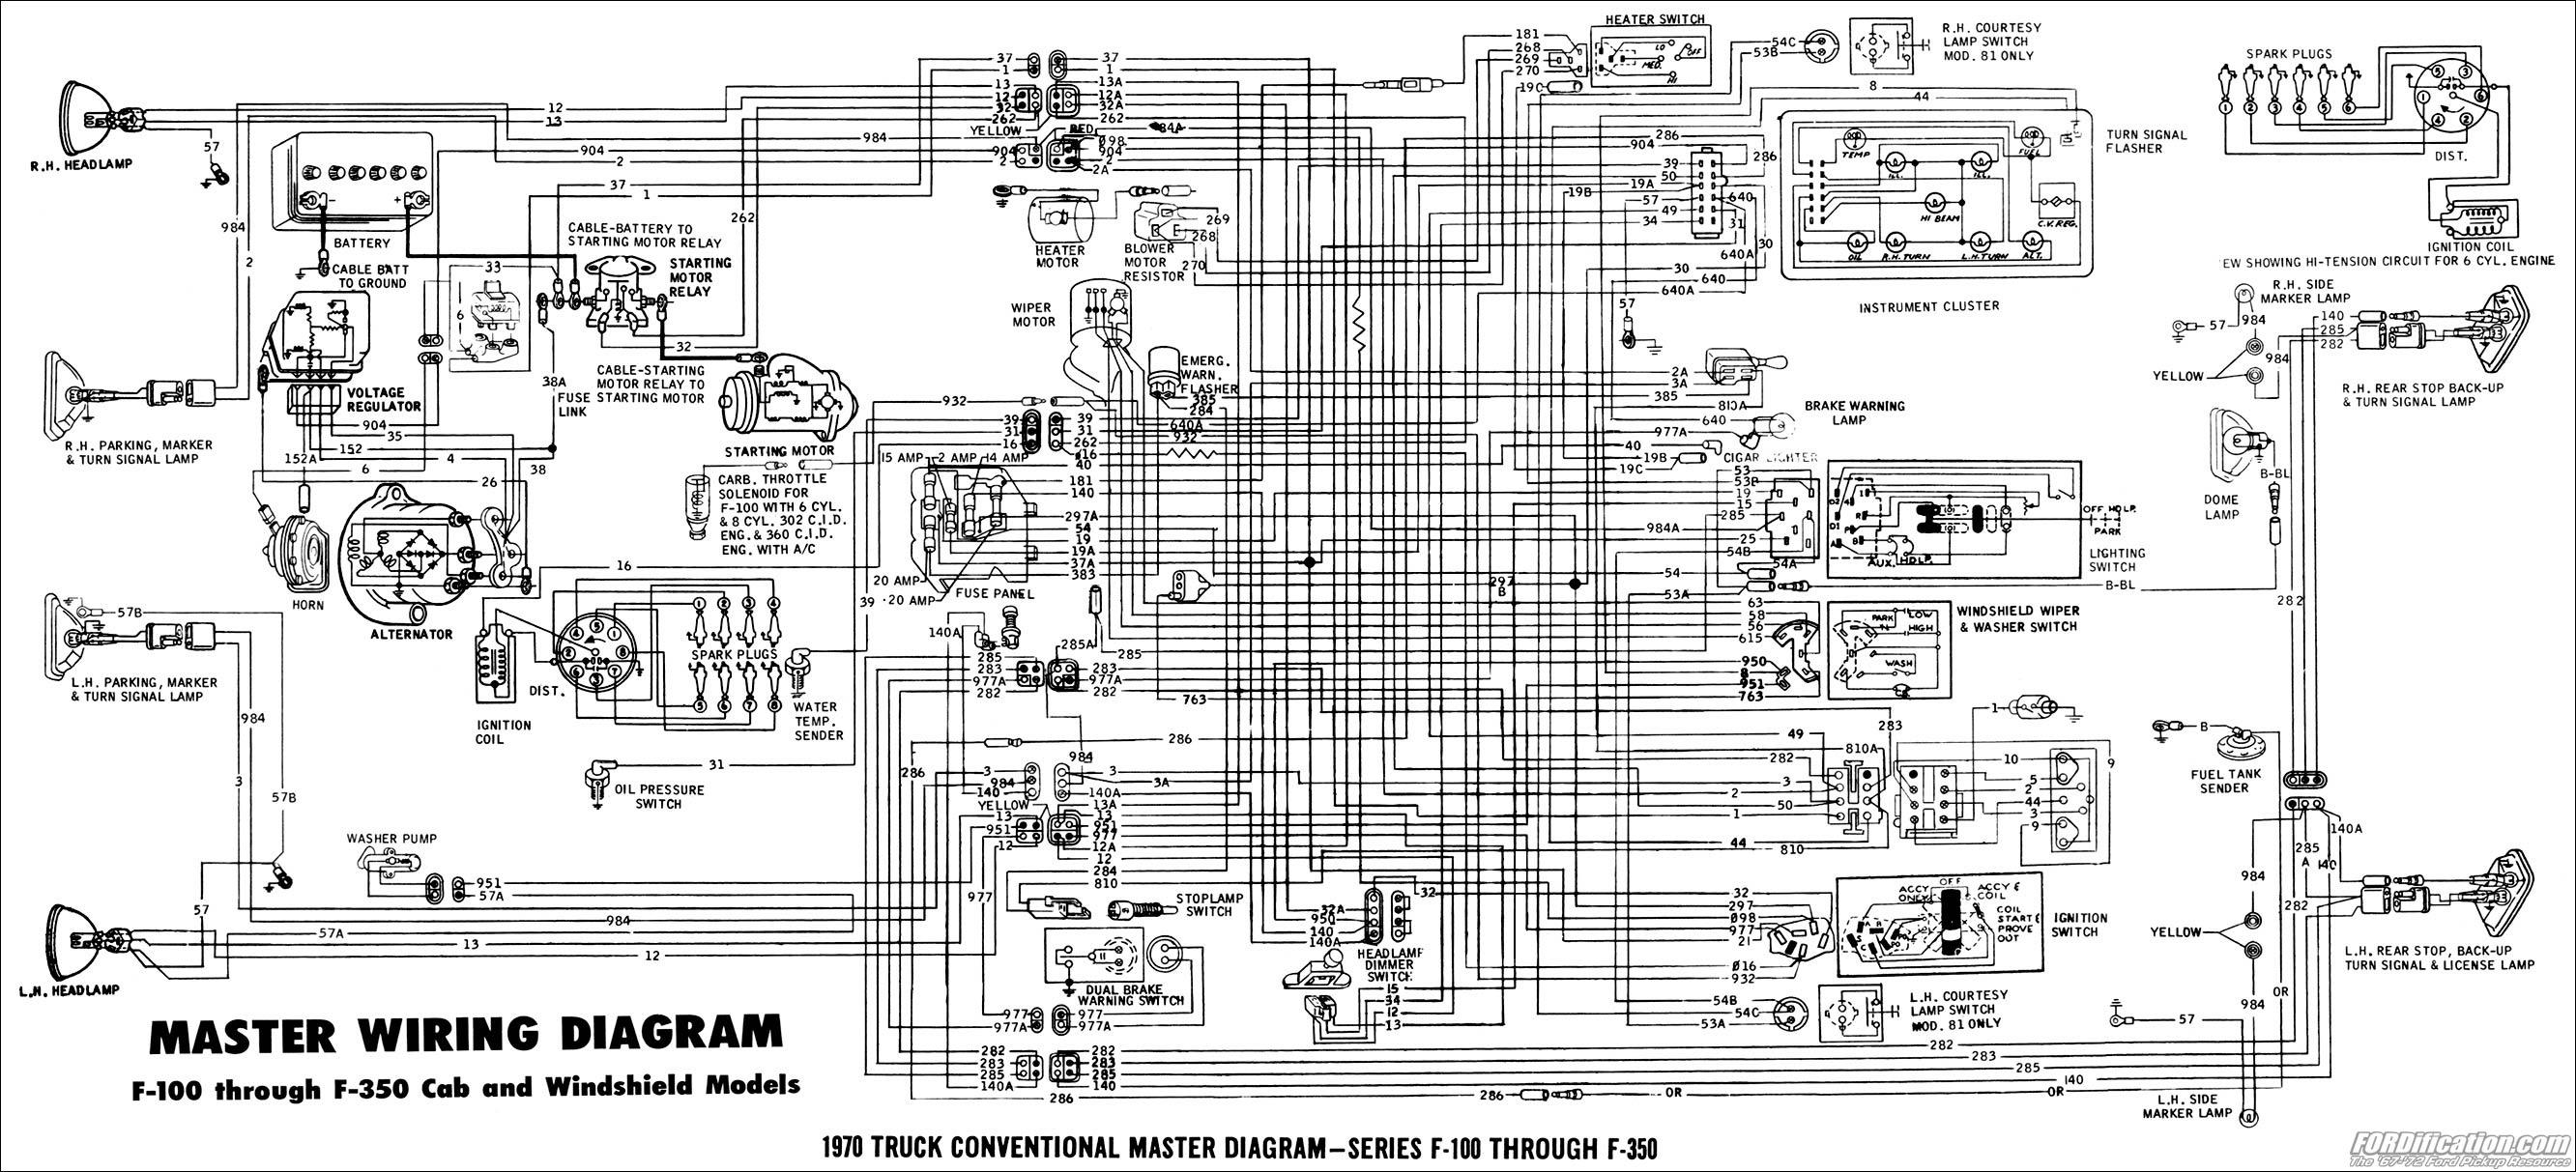 1940 Ford Wiring Diagram Wiring Diagram United2 United2 Maceratadoc It